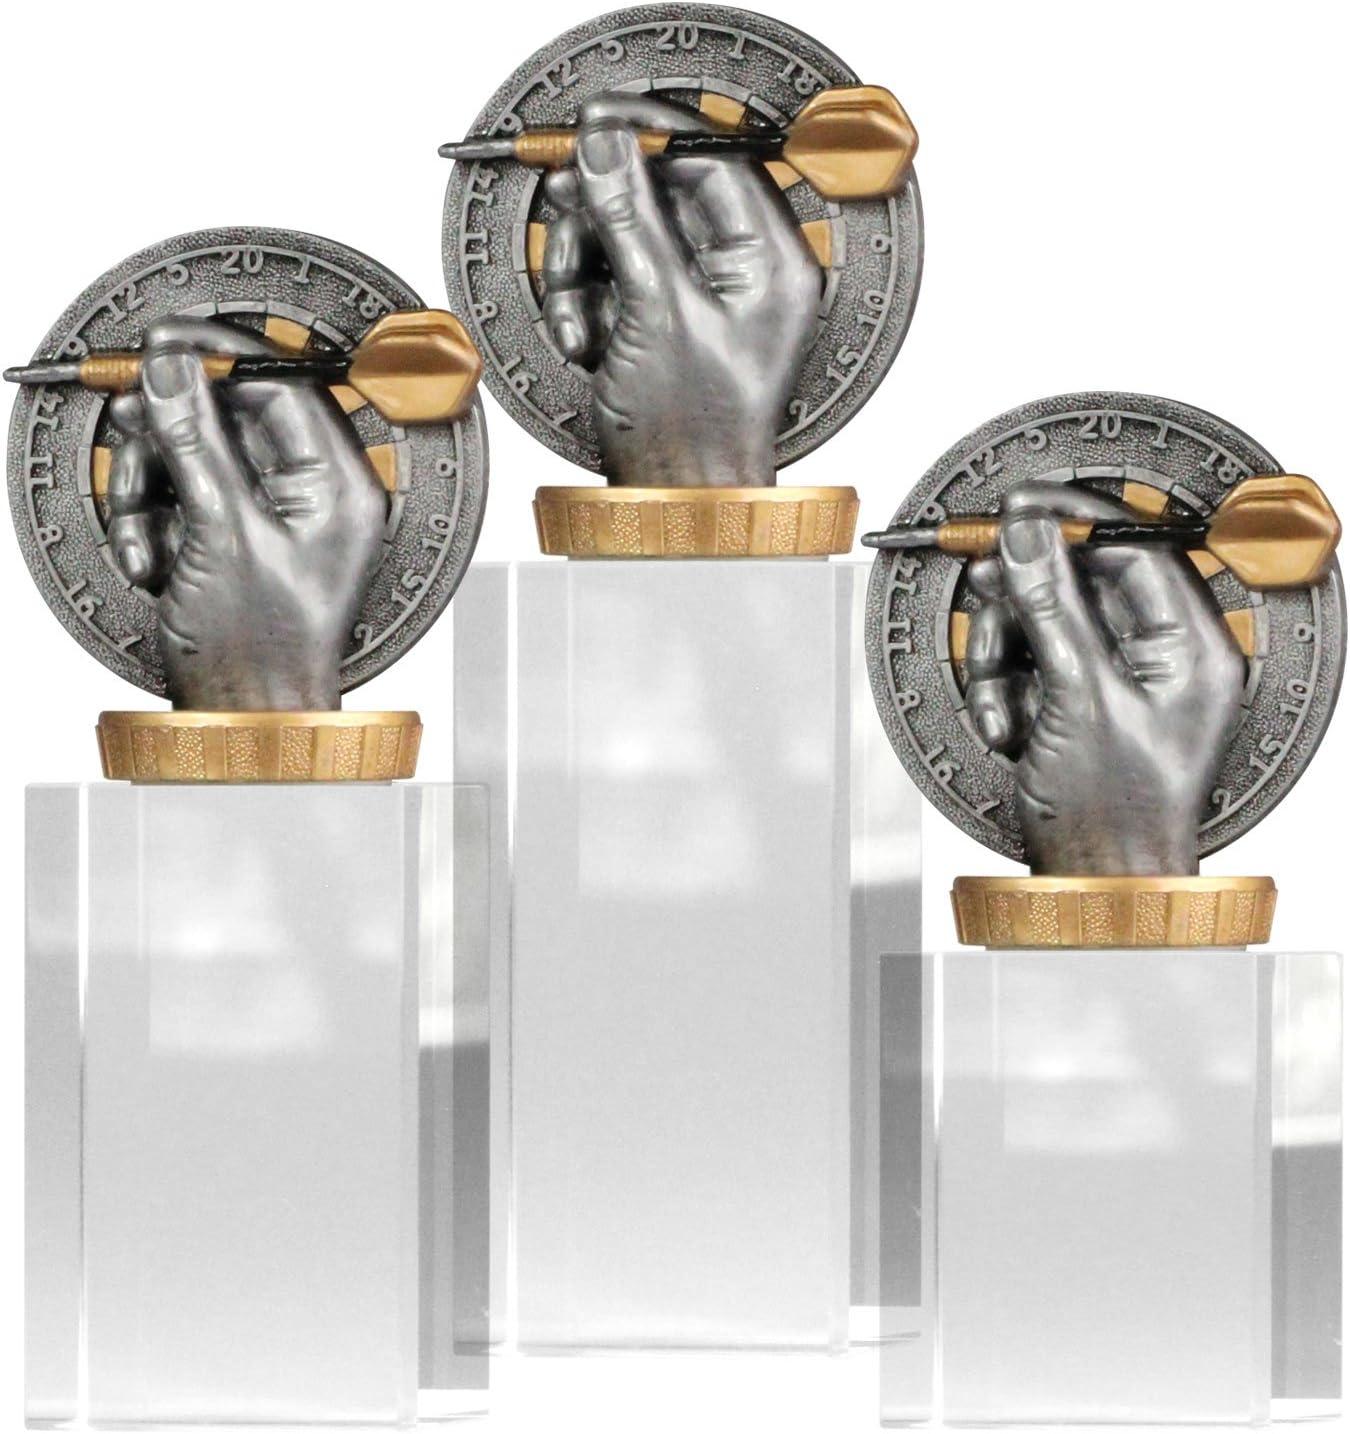 pokalspezialist Pokal Troph/äe Dart//Darts mit Glassockel Gr/ö/ße S M und L